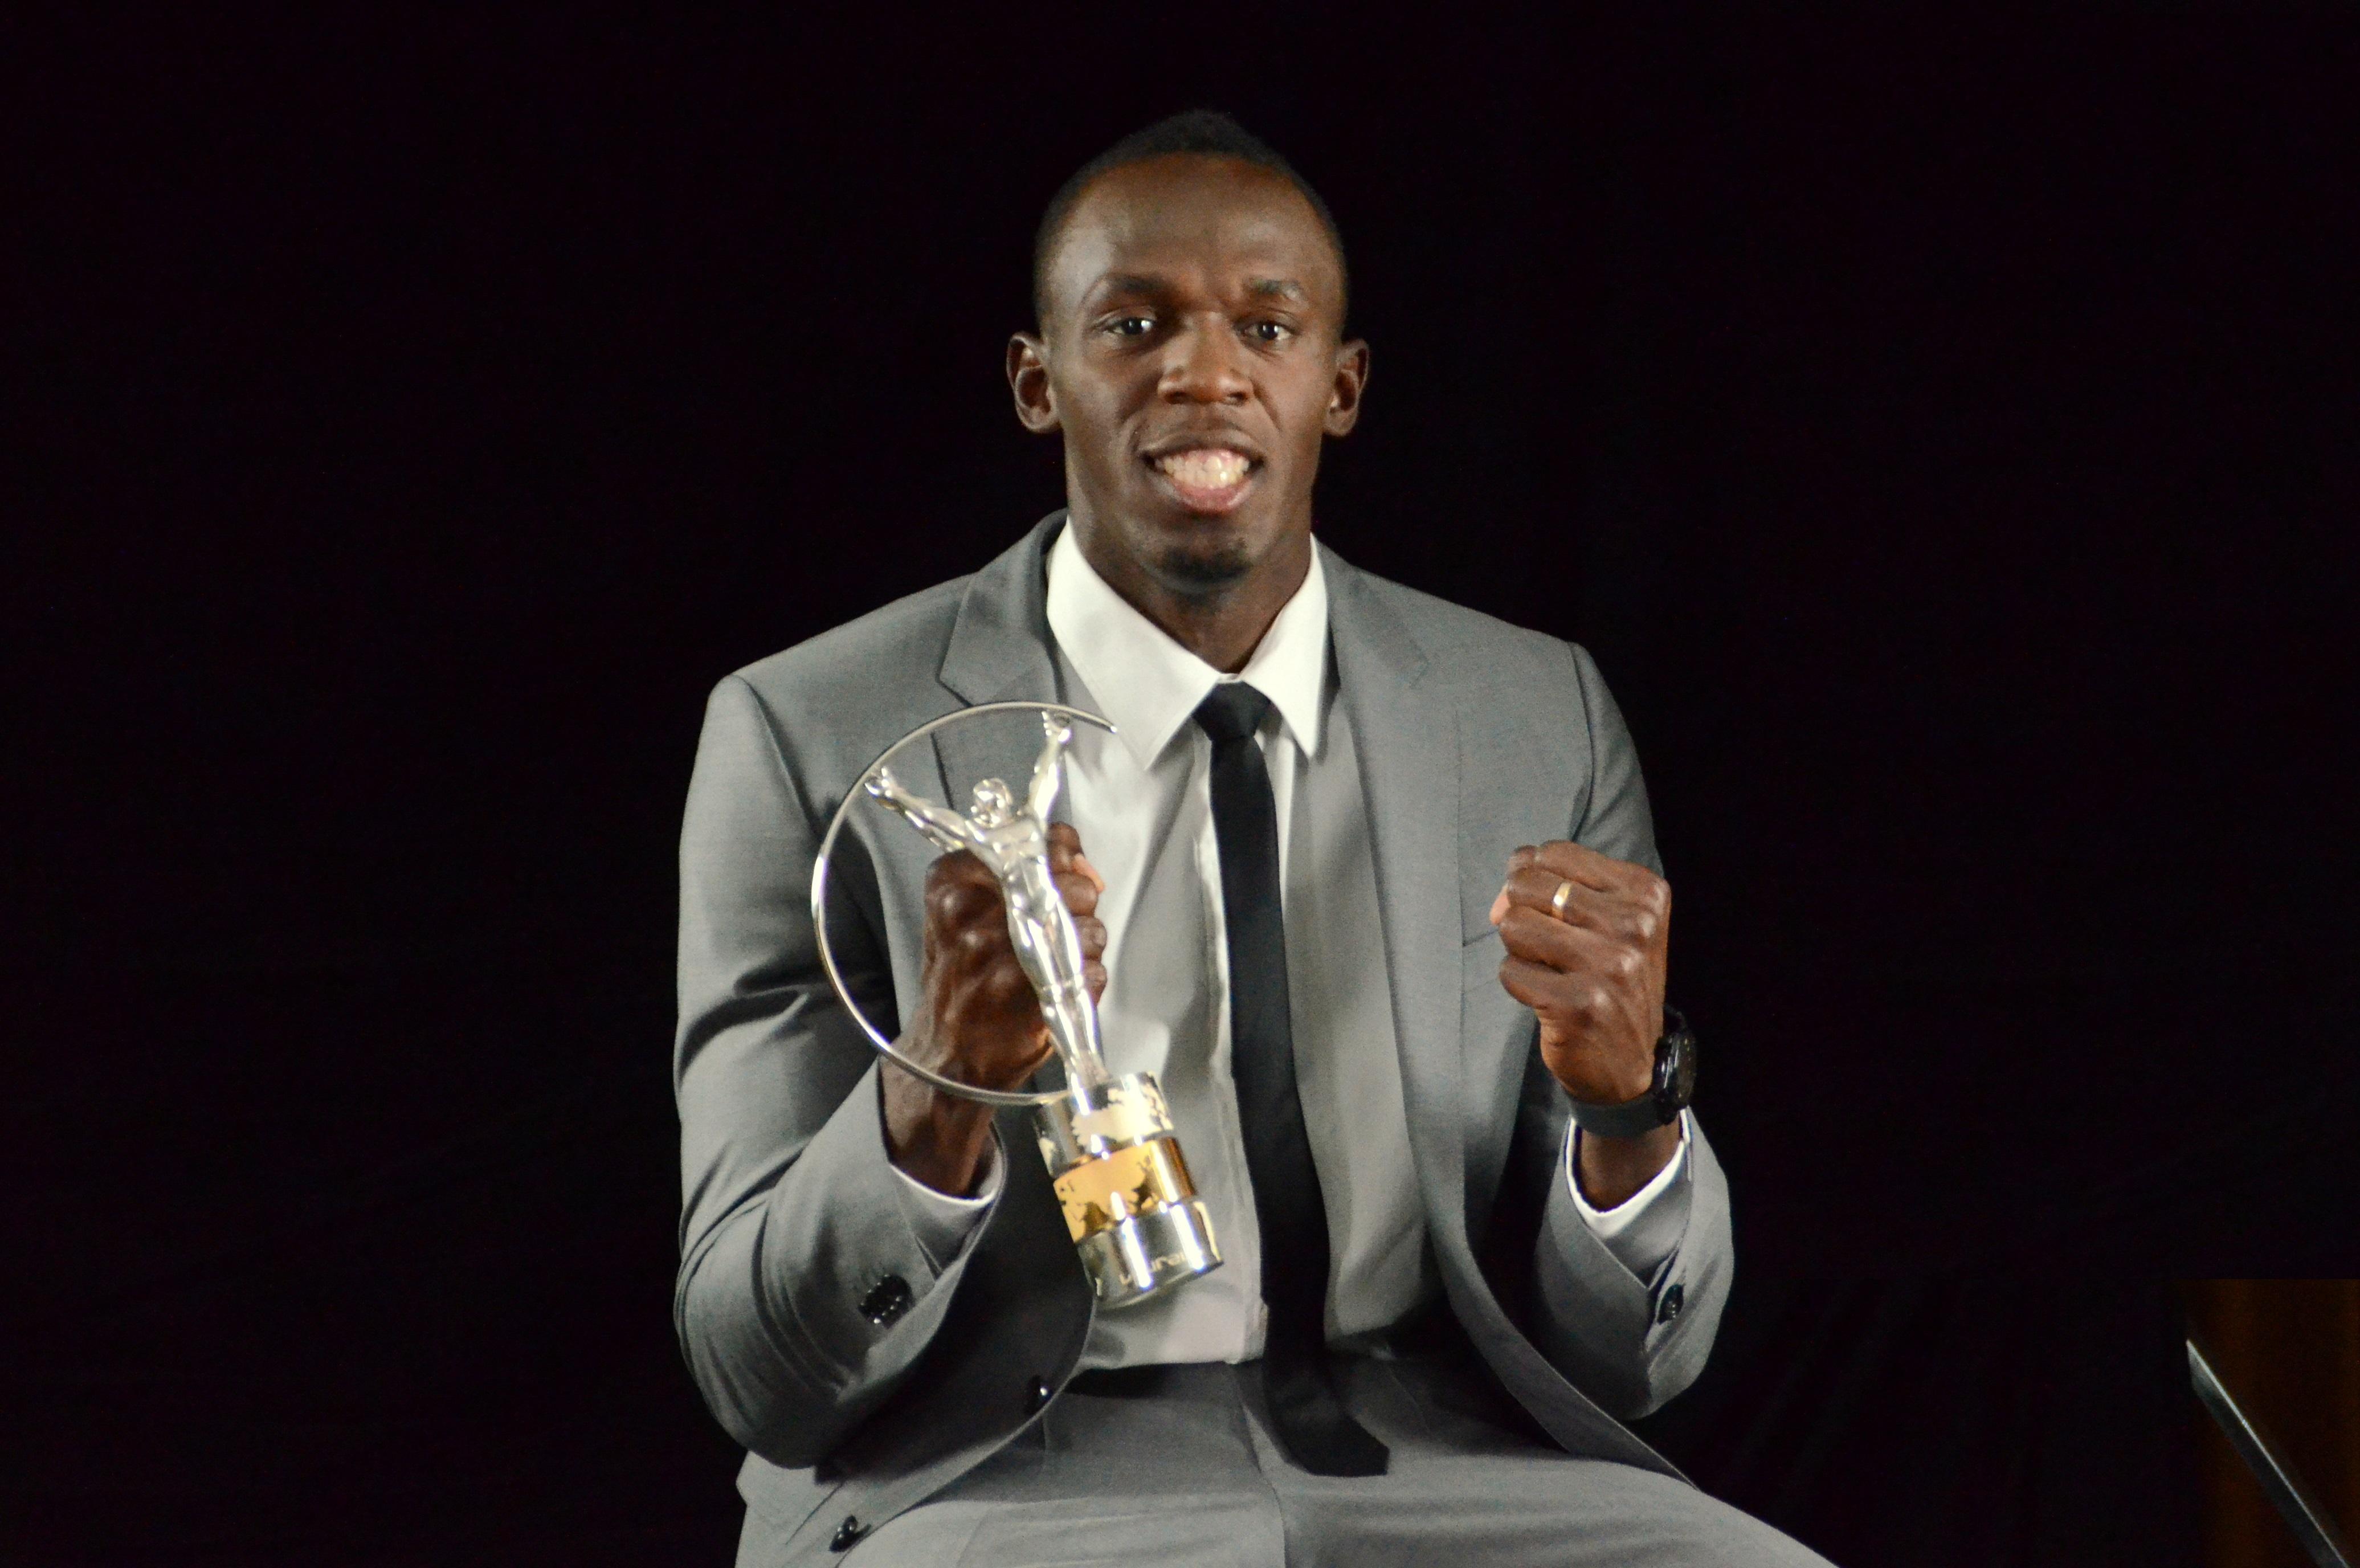 Laureus World Sportsman of the Year 2013